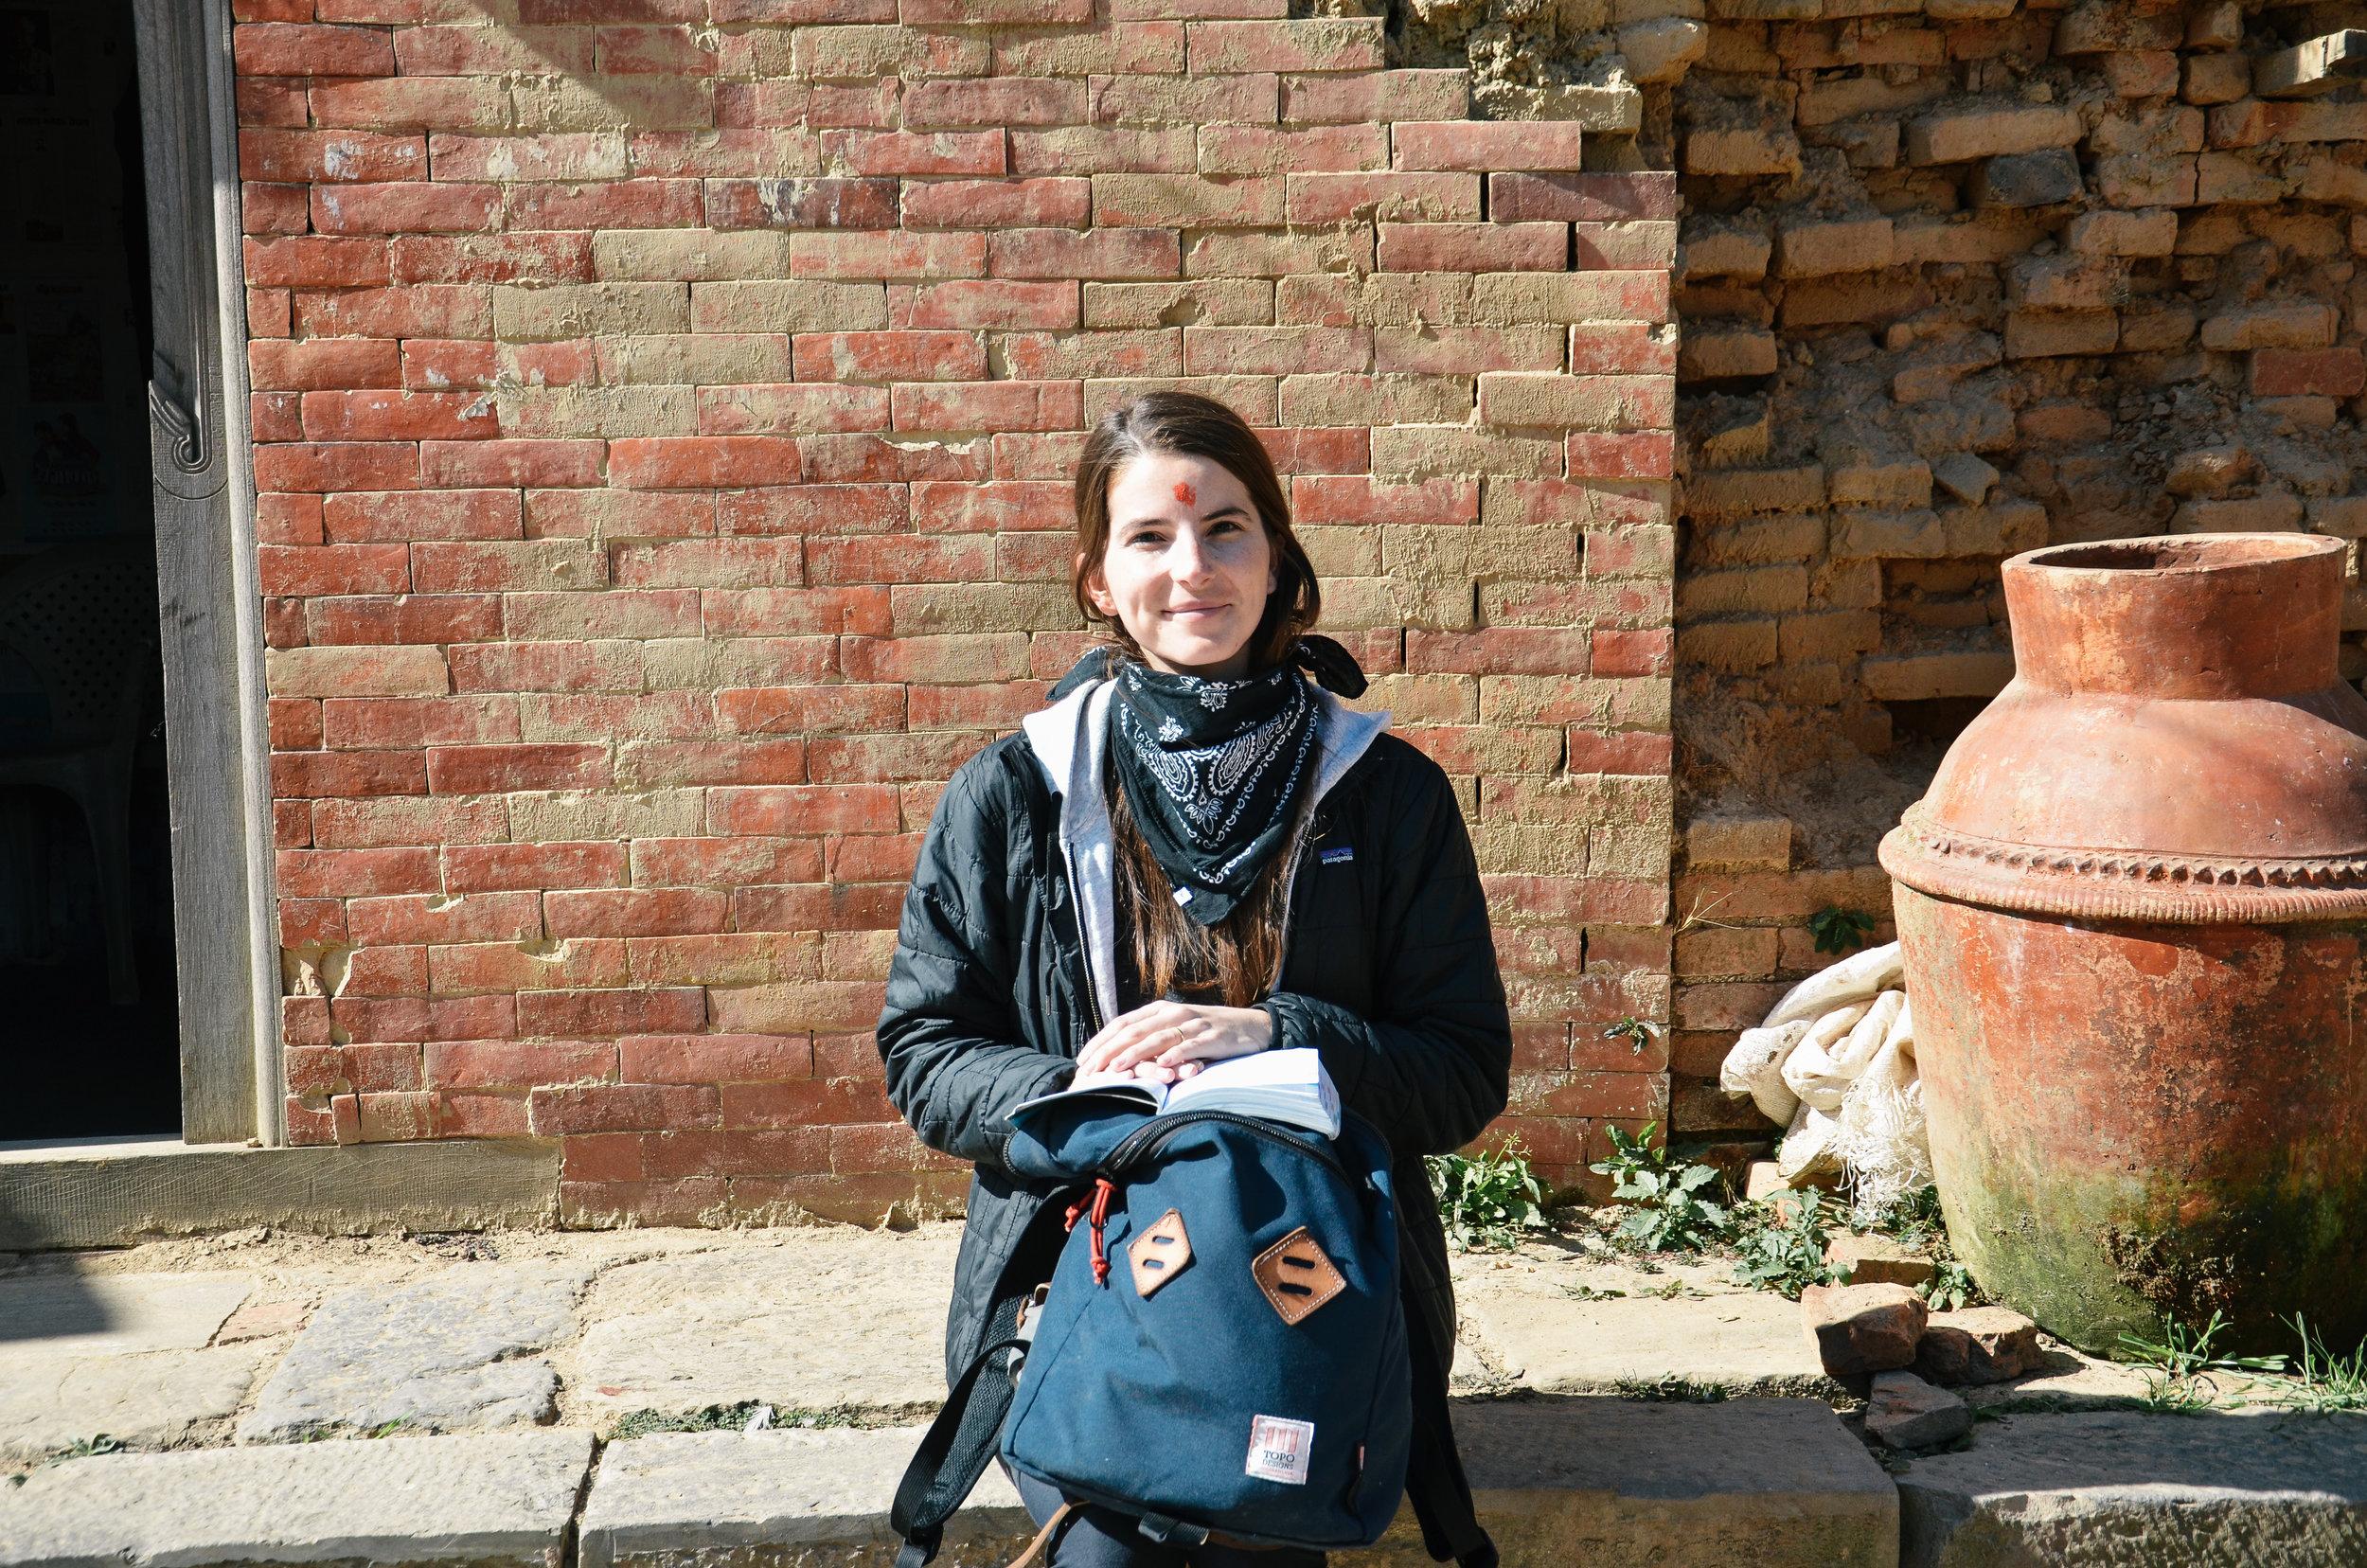 10-things-to-know-kathmandu-nepal-lifeonpine_DSC_0618.jpg